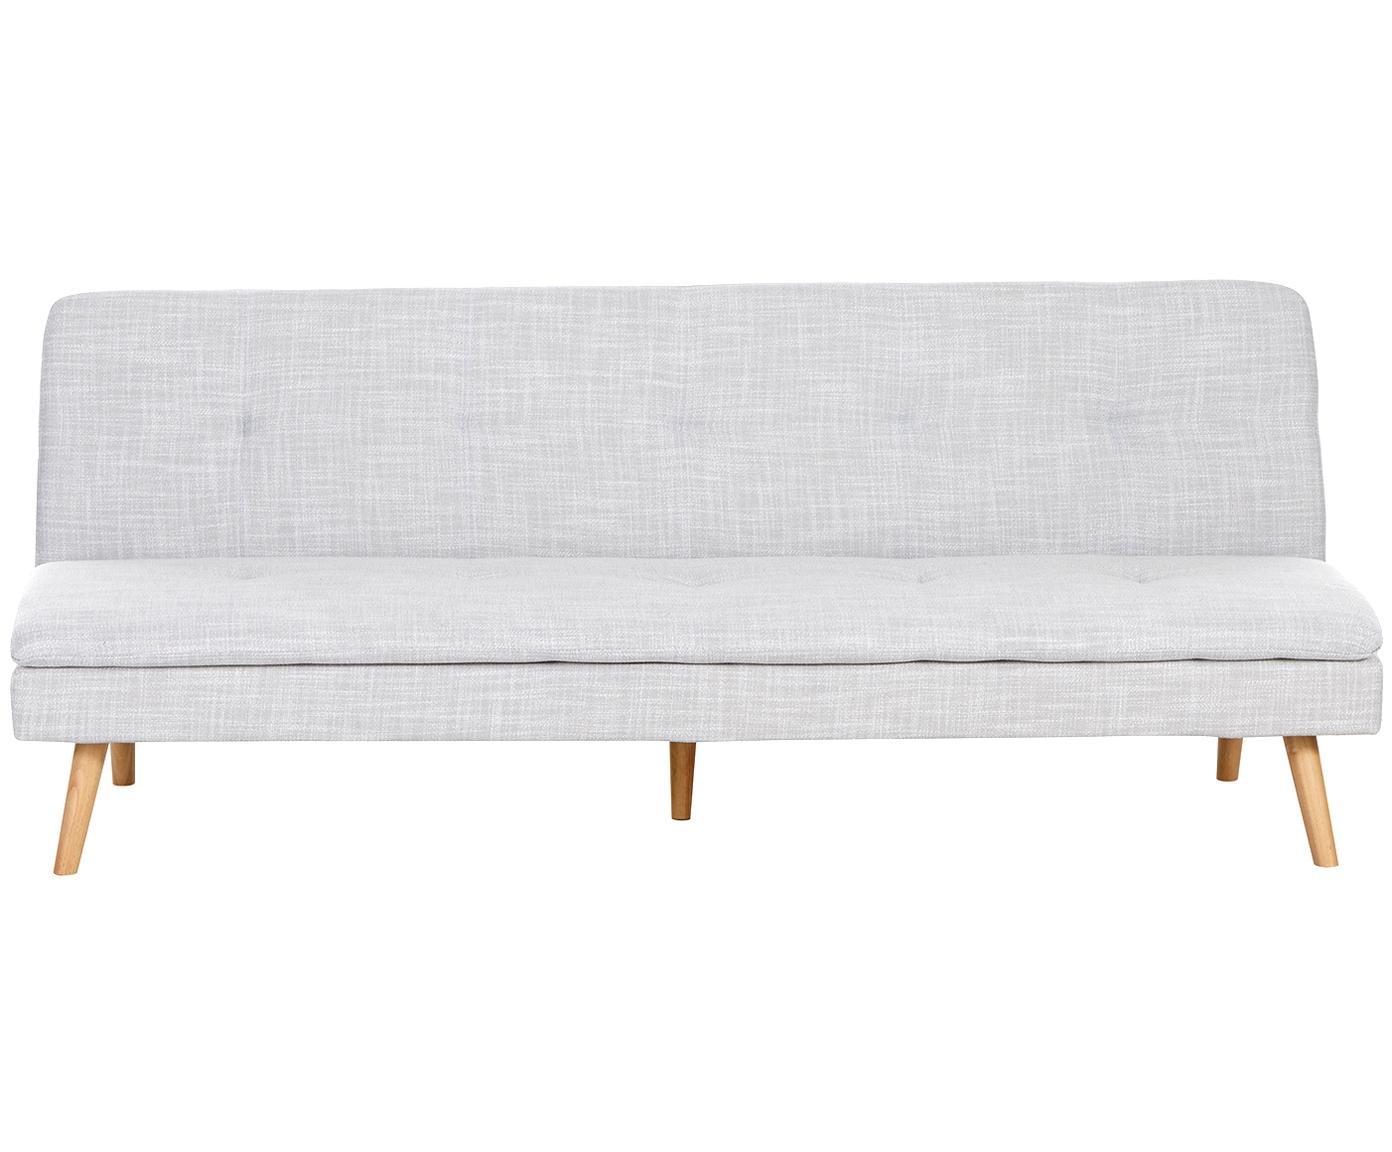 Schlafsofa Amelie, Bezug: Polyester 30.000 Scheuert, Gestell: Kiefernholz, Webstoff Hellgrau, 200 x 79 cm